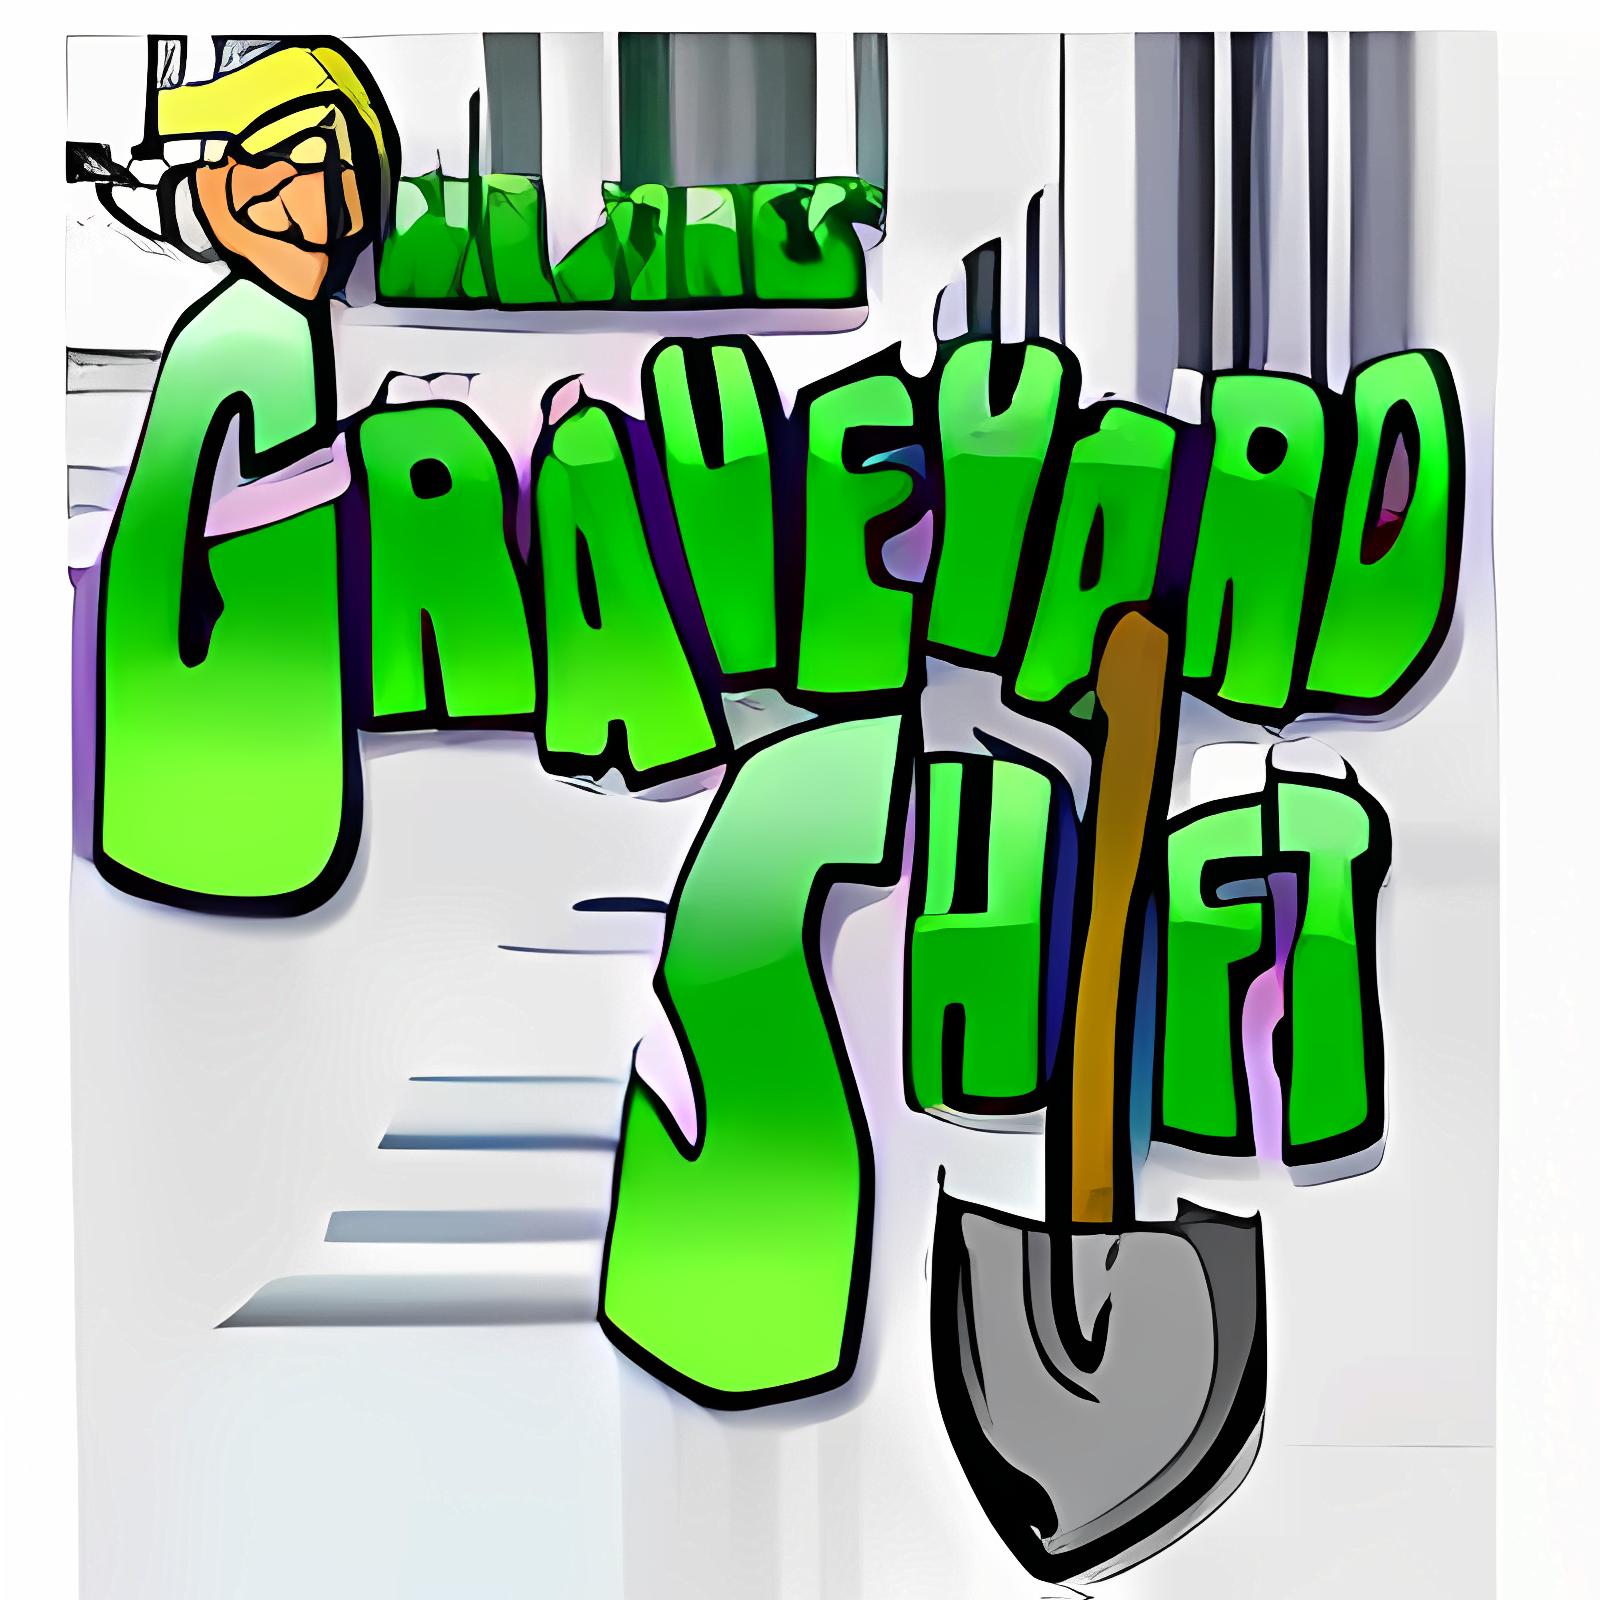 Mr Jones Graveyard Shift